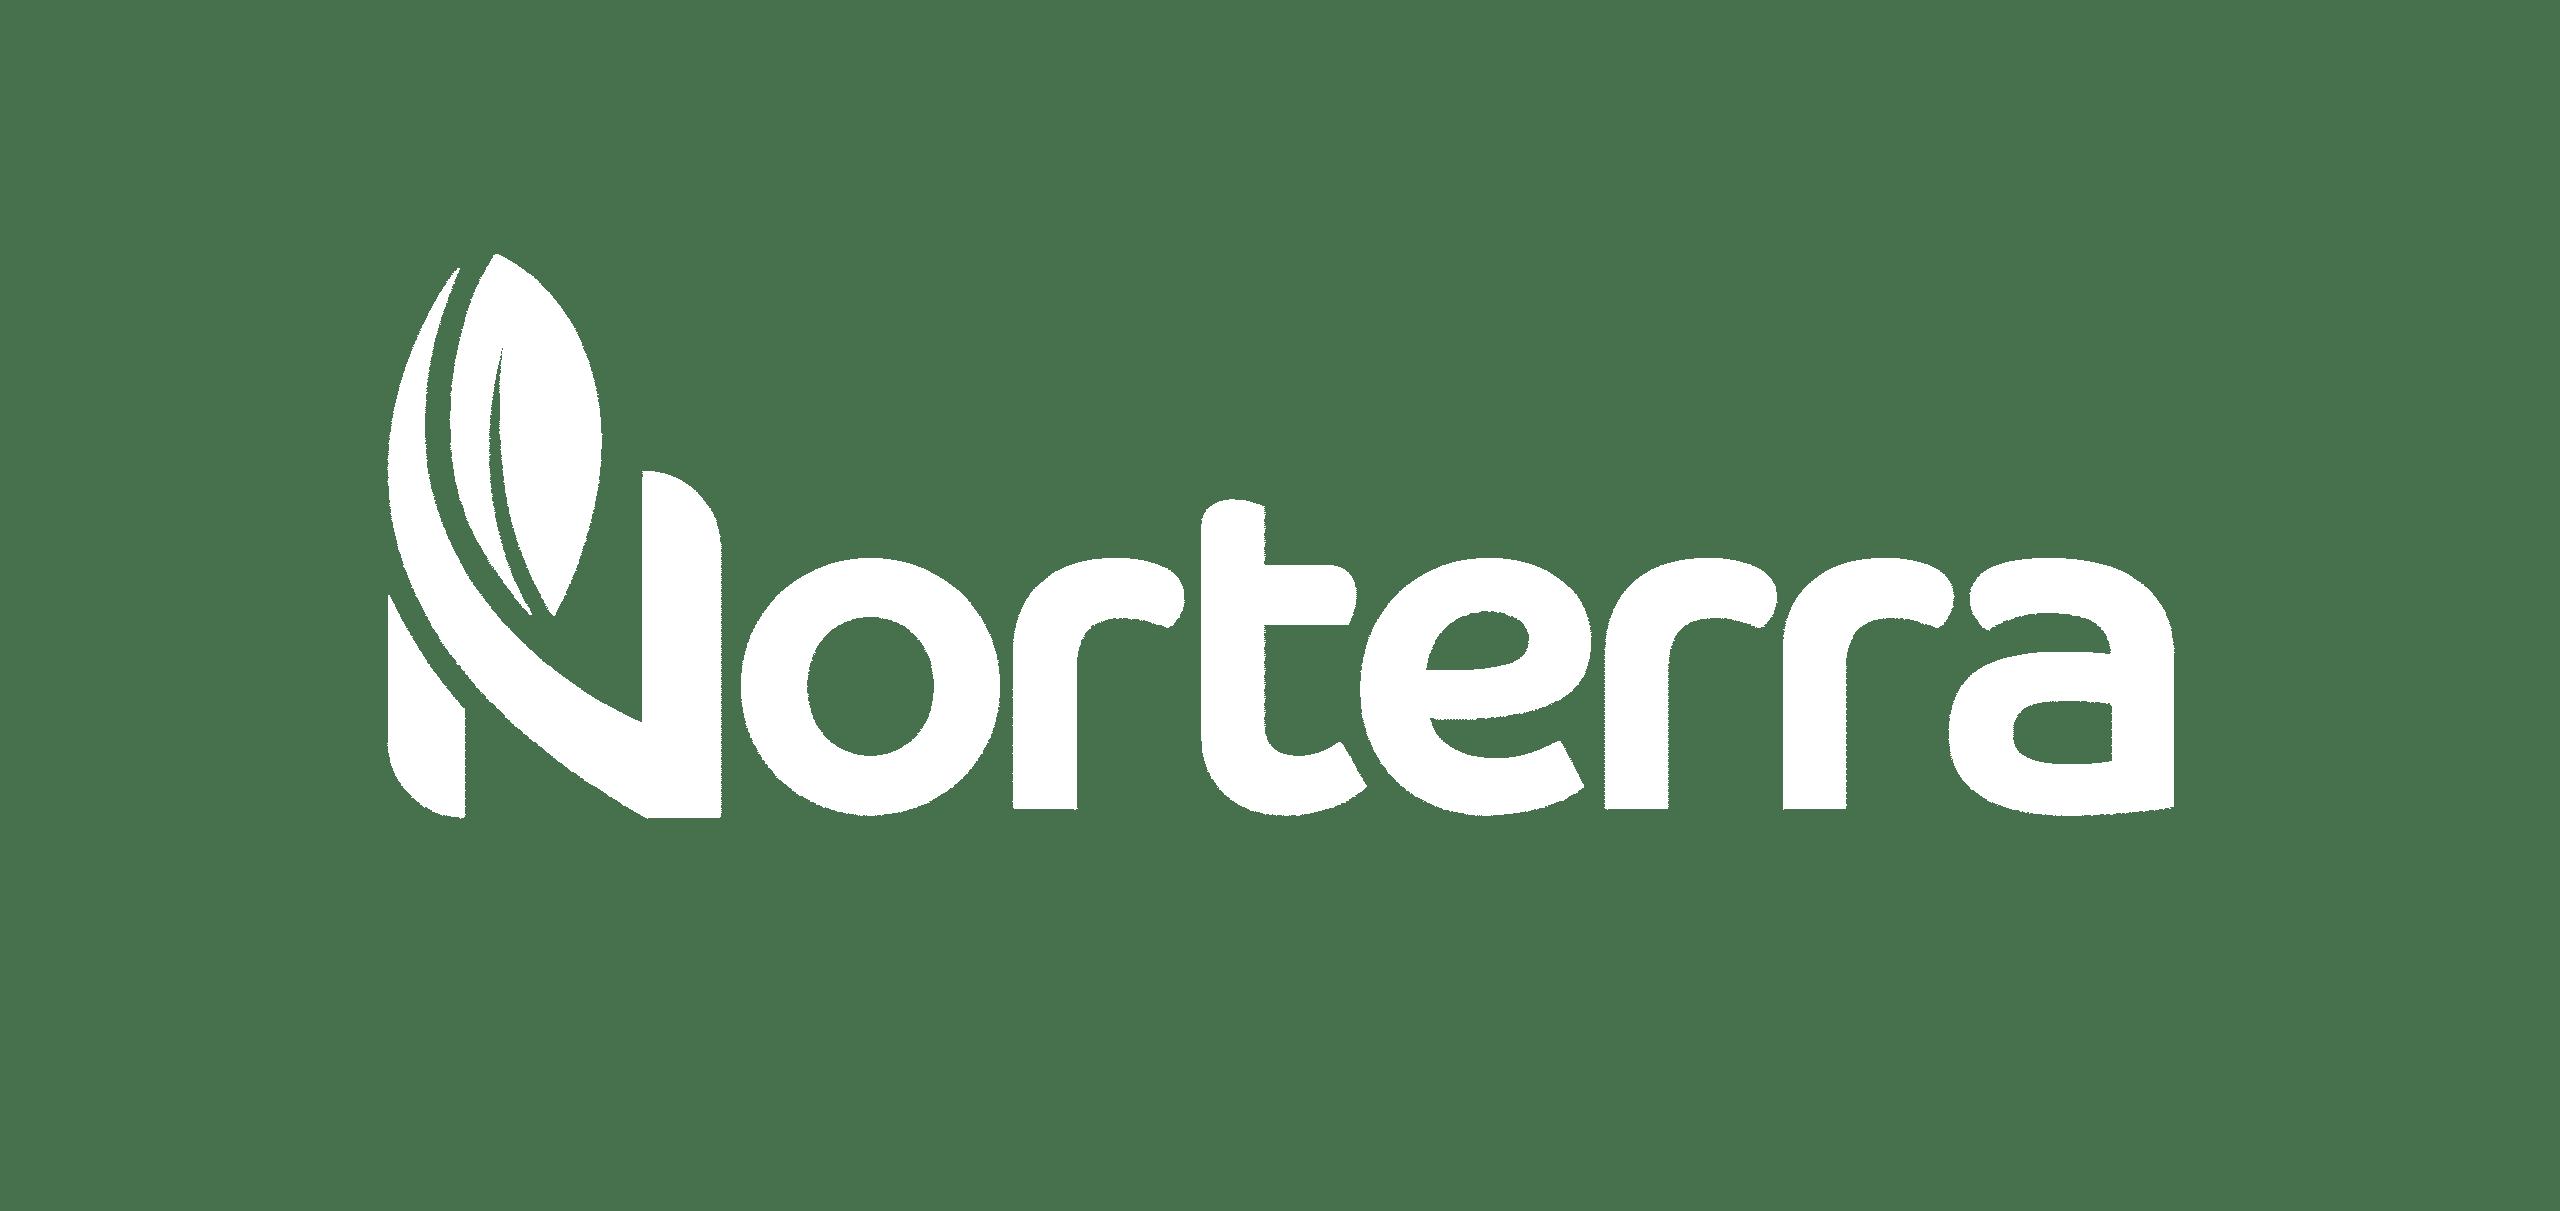 Norterra